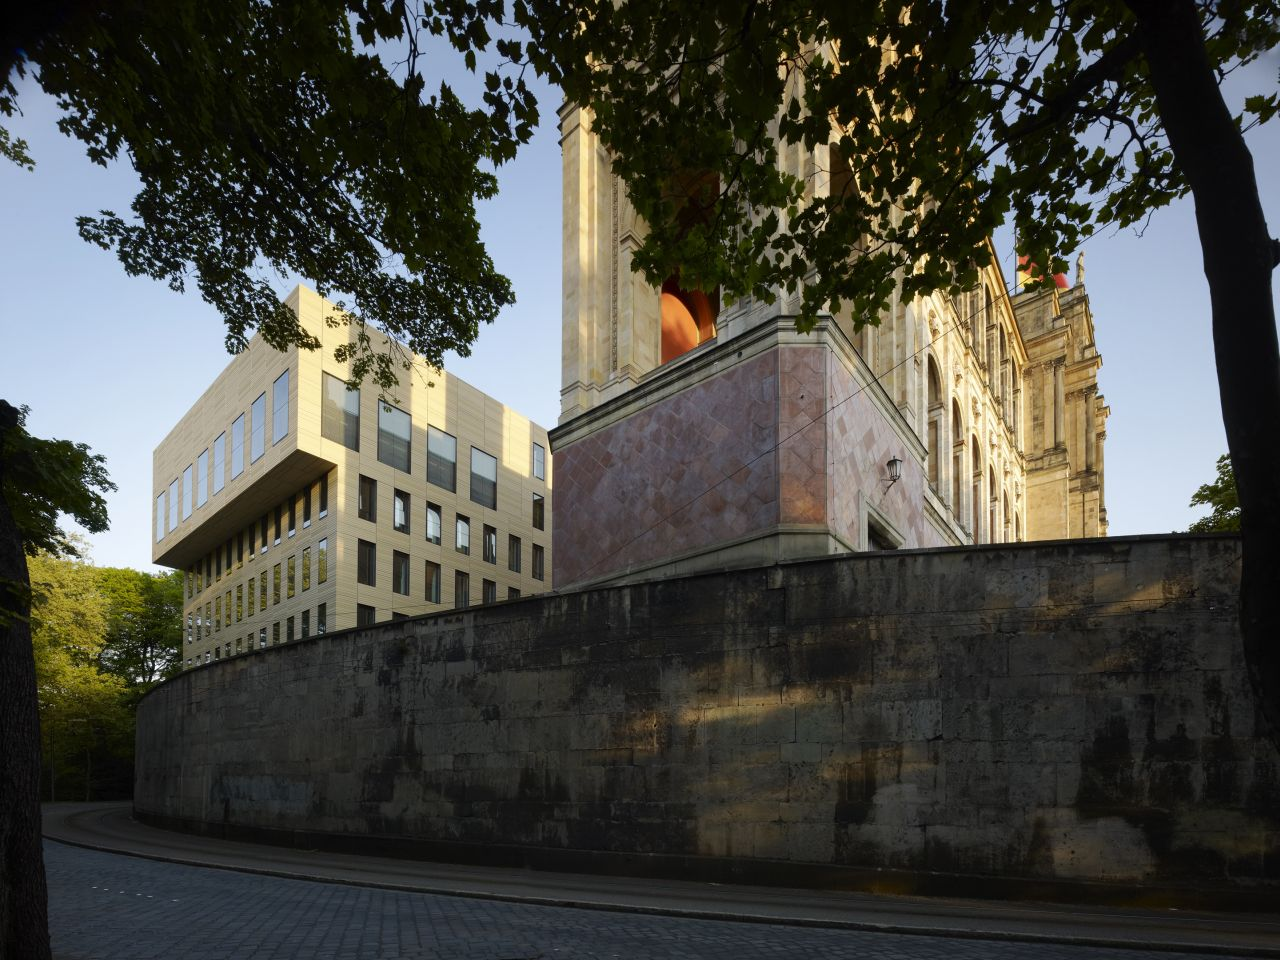 Bavarian Parlament / Léon Wohlhage Wernik Architekten, © Christian Richters